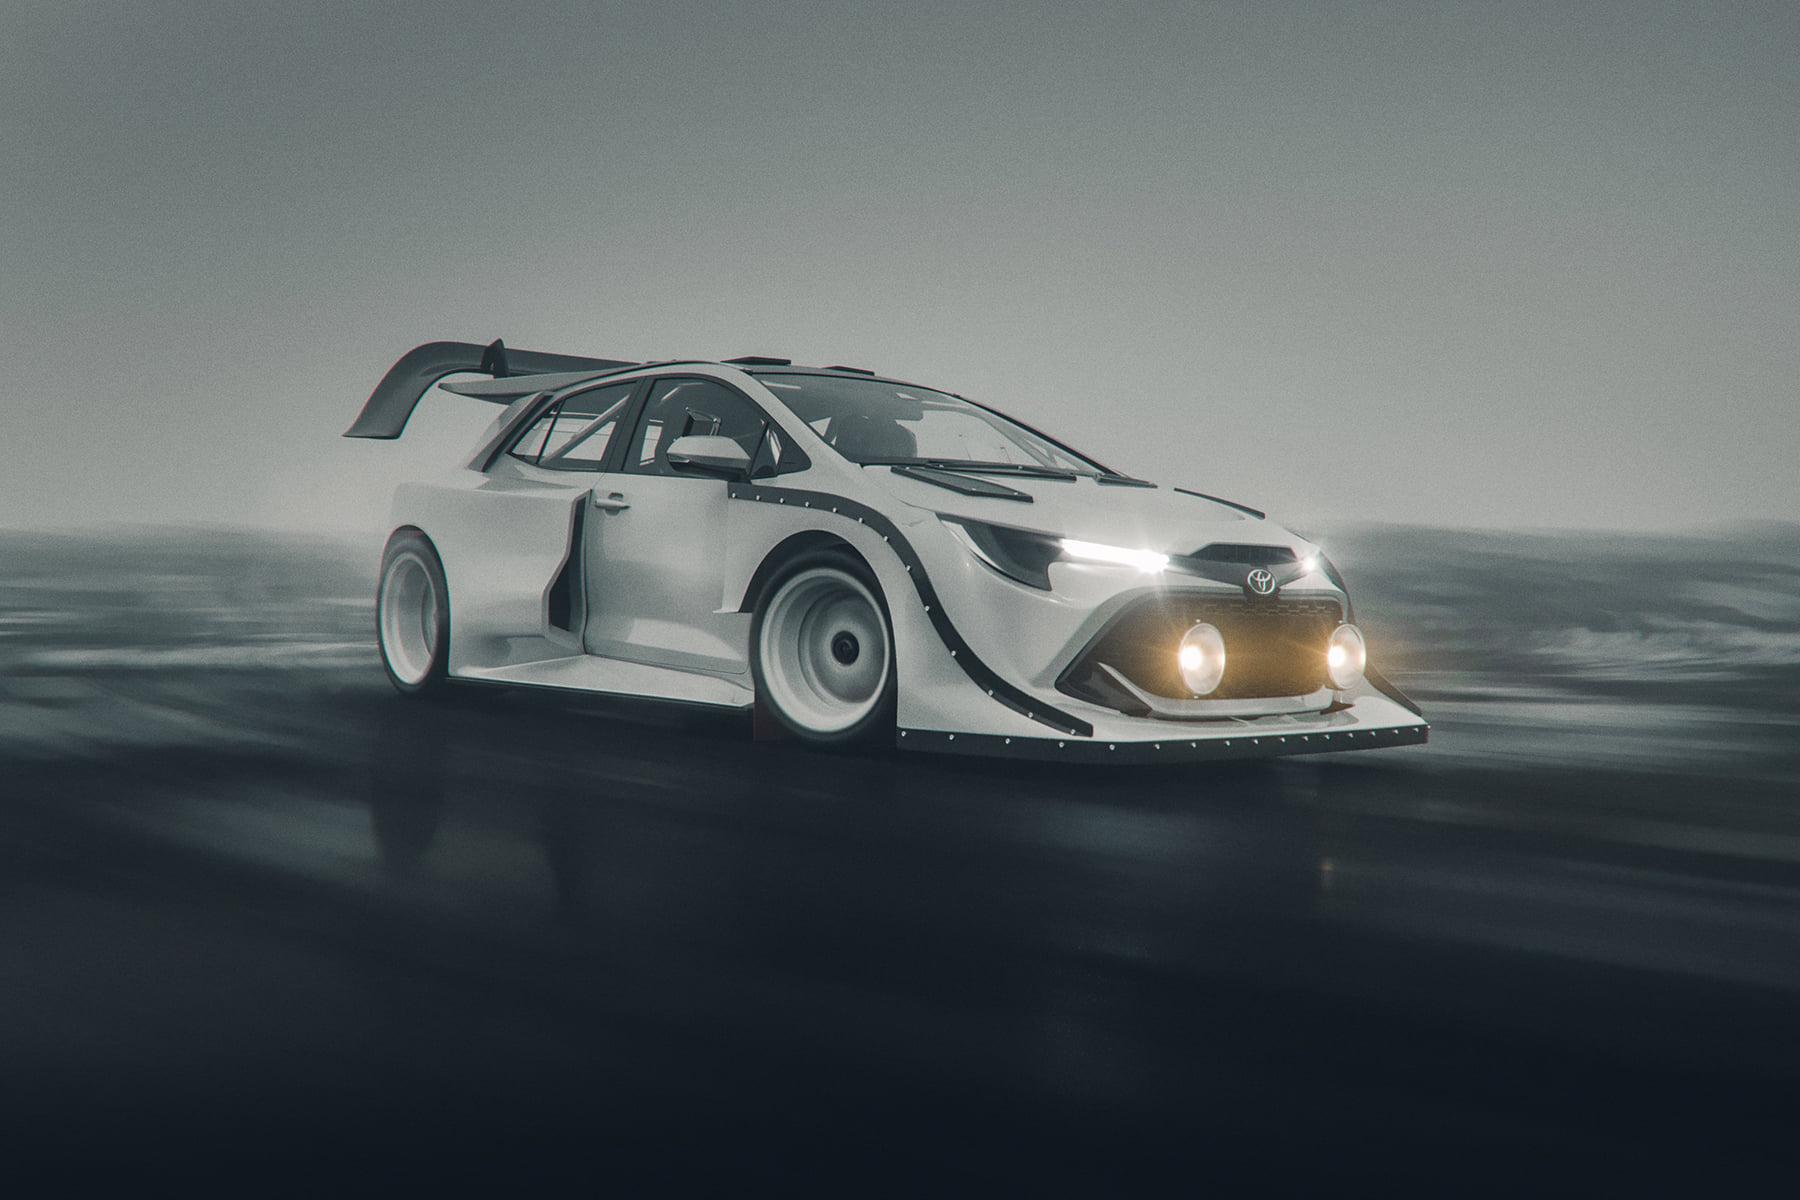 Toyota-GR-Corolla-Group-B-rally-car-3